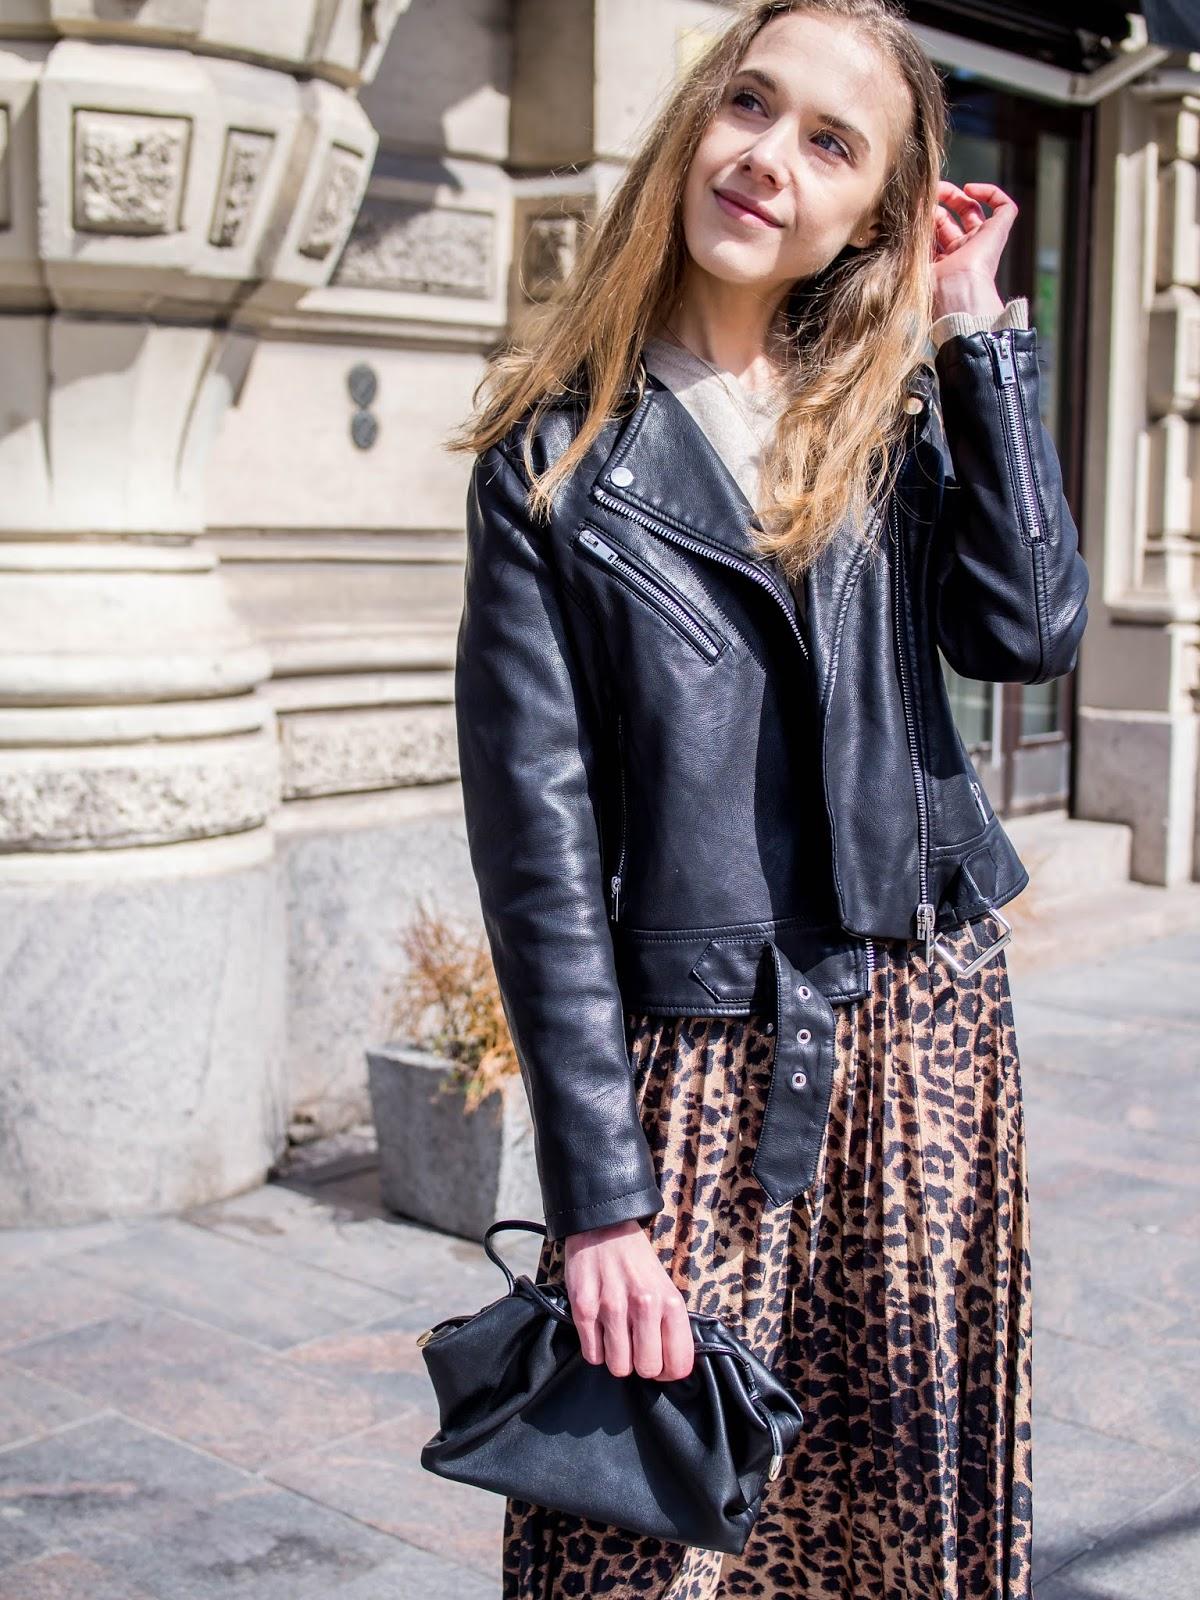 Spring outfit with leopard print midi skirt - Kevätasu leopardihameen kanssa